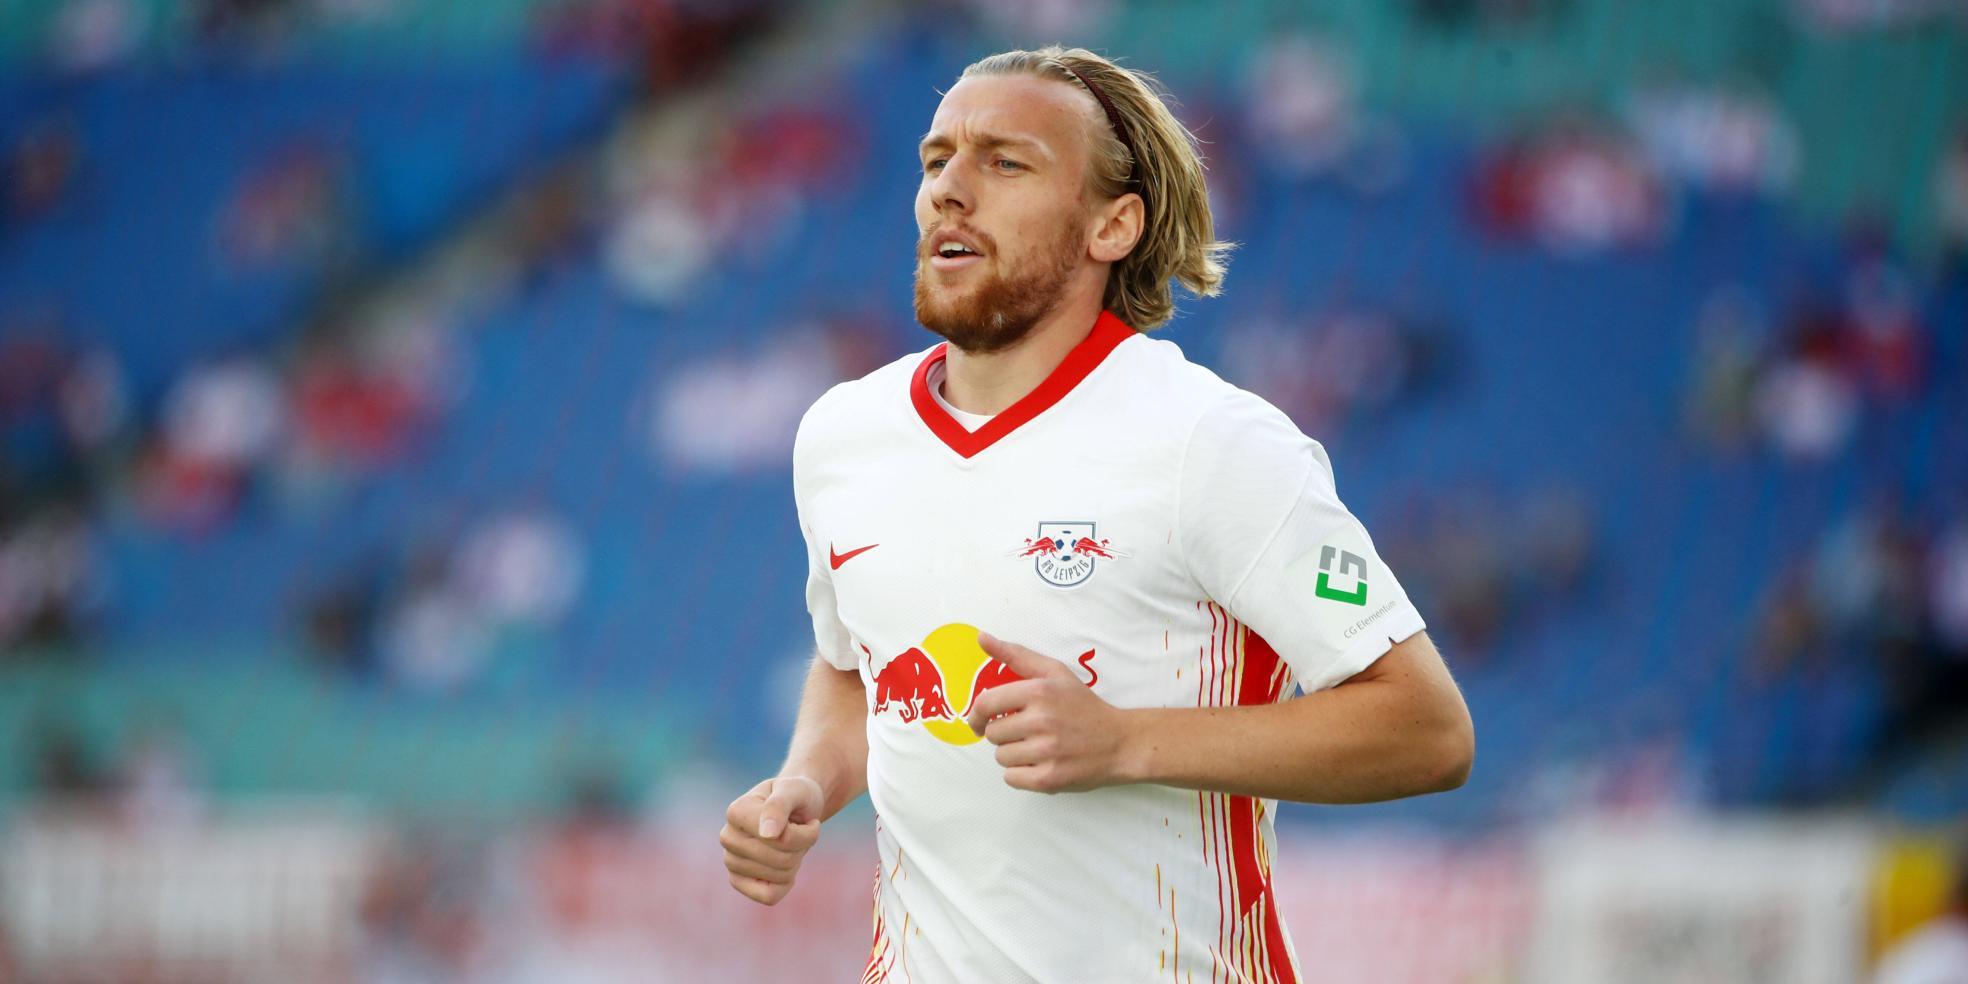 Emil Forsberg von RB Leipzig